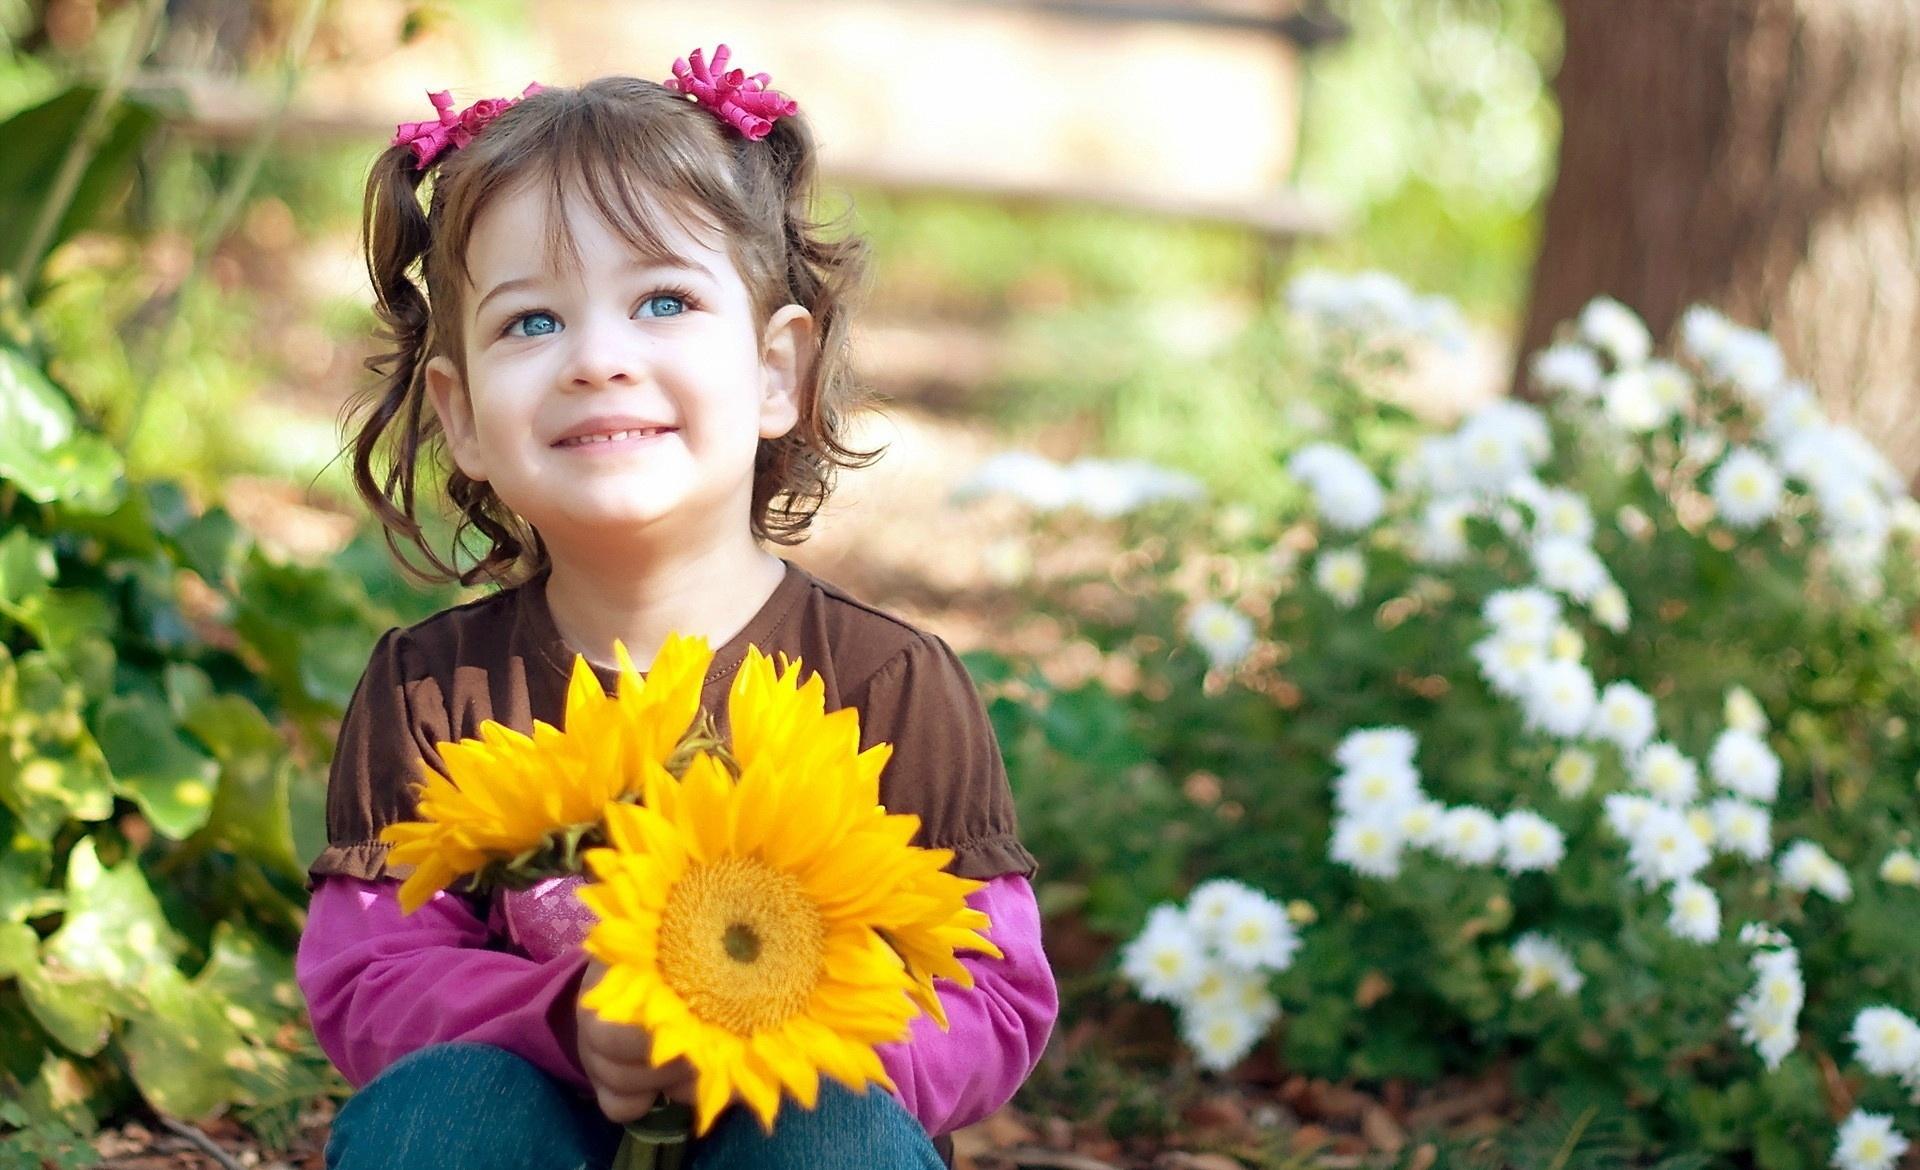 Kids mood smile girl wallpaper 1920x1170 210395 WallpaperUP